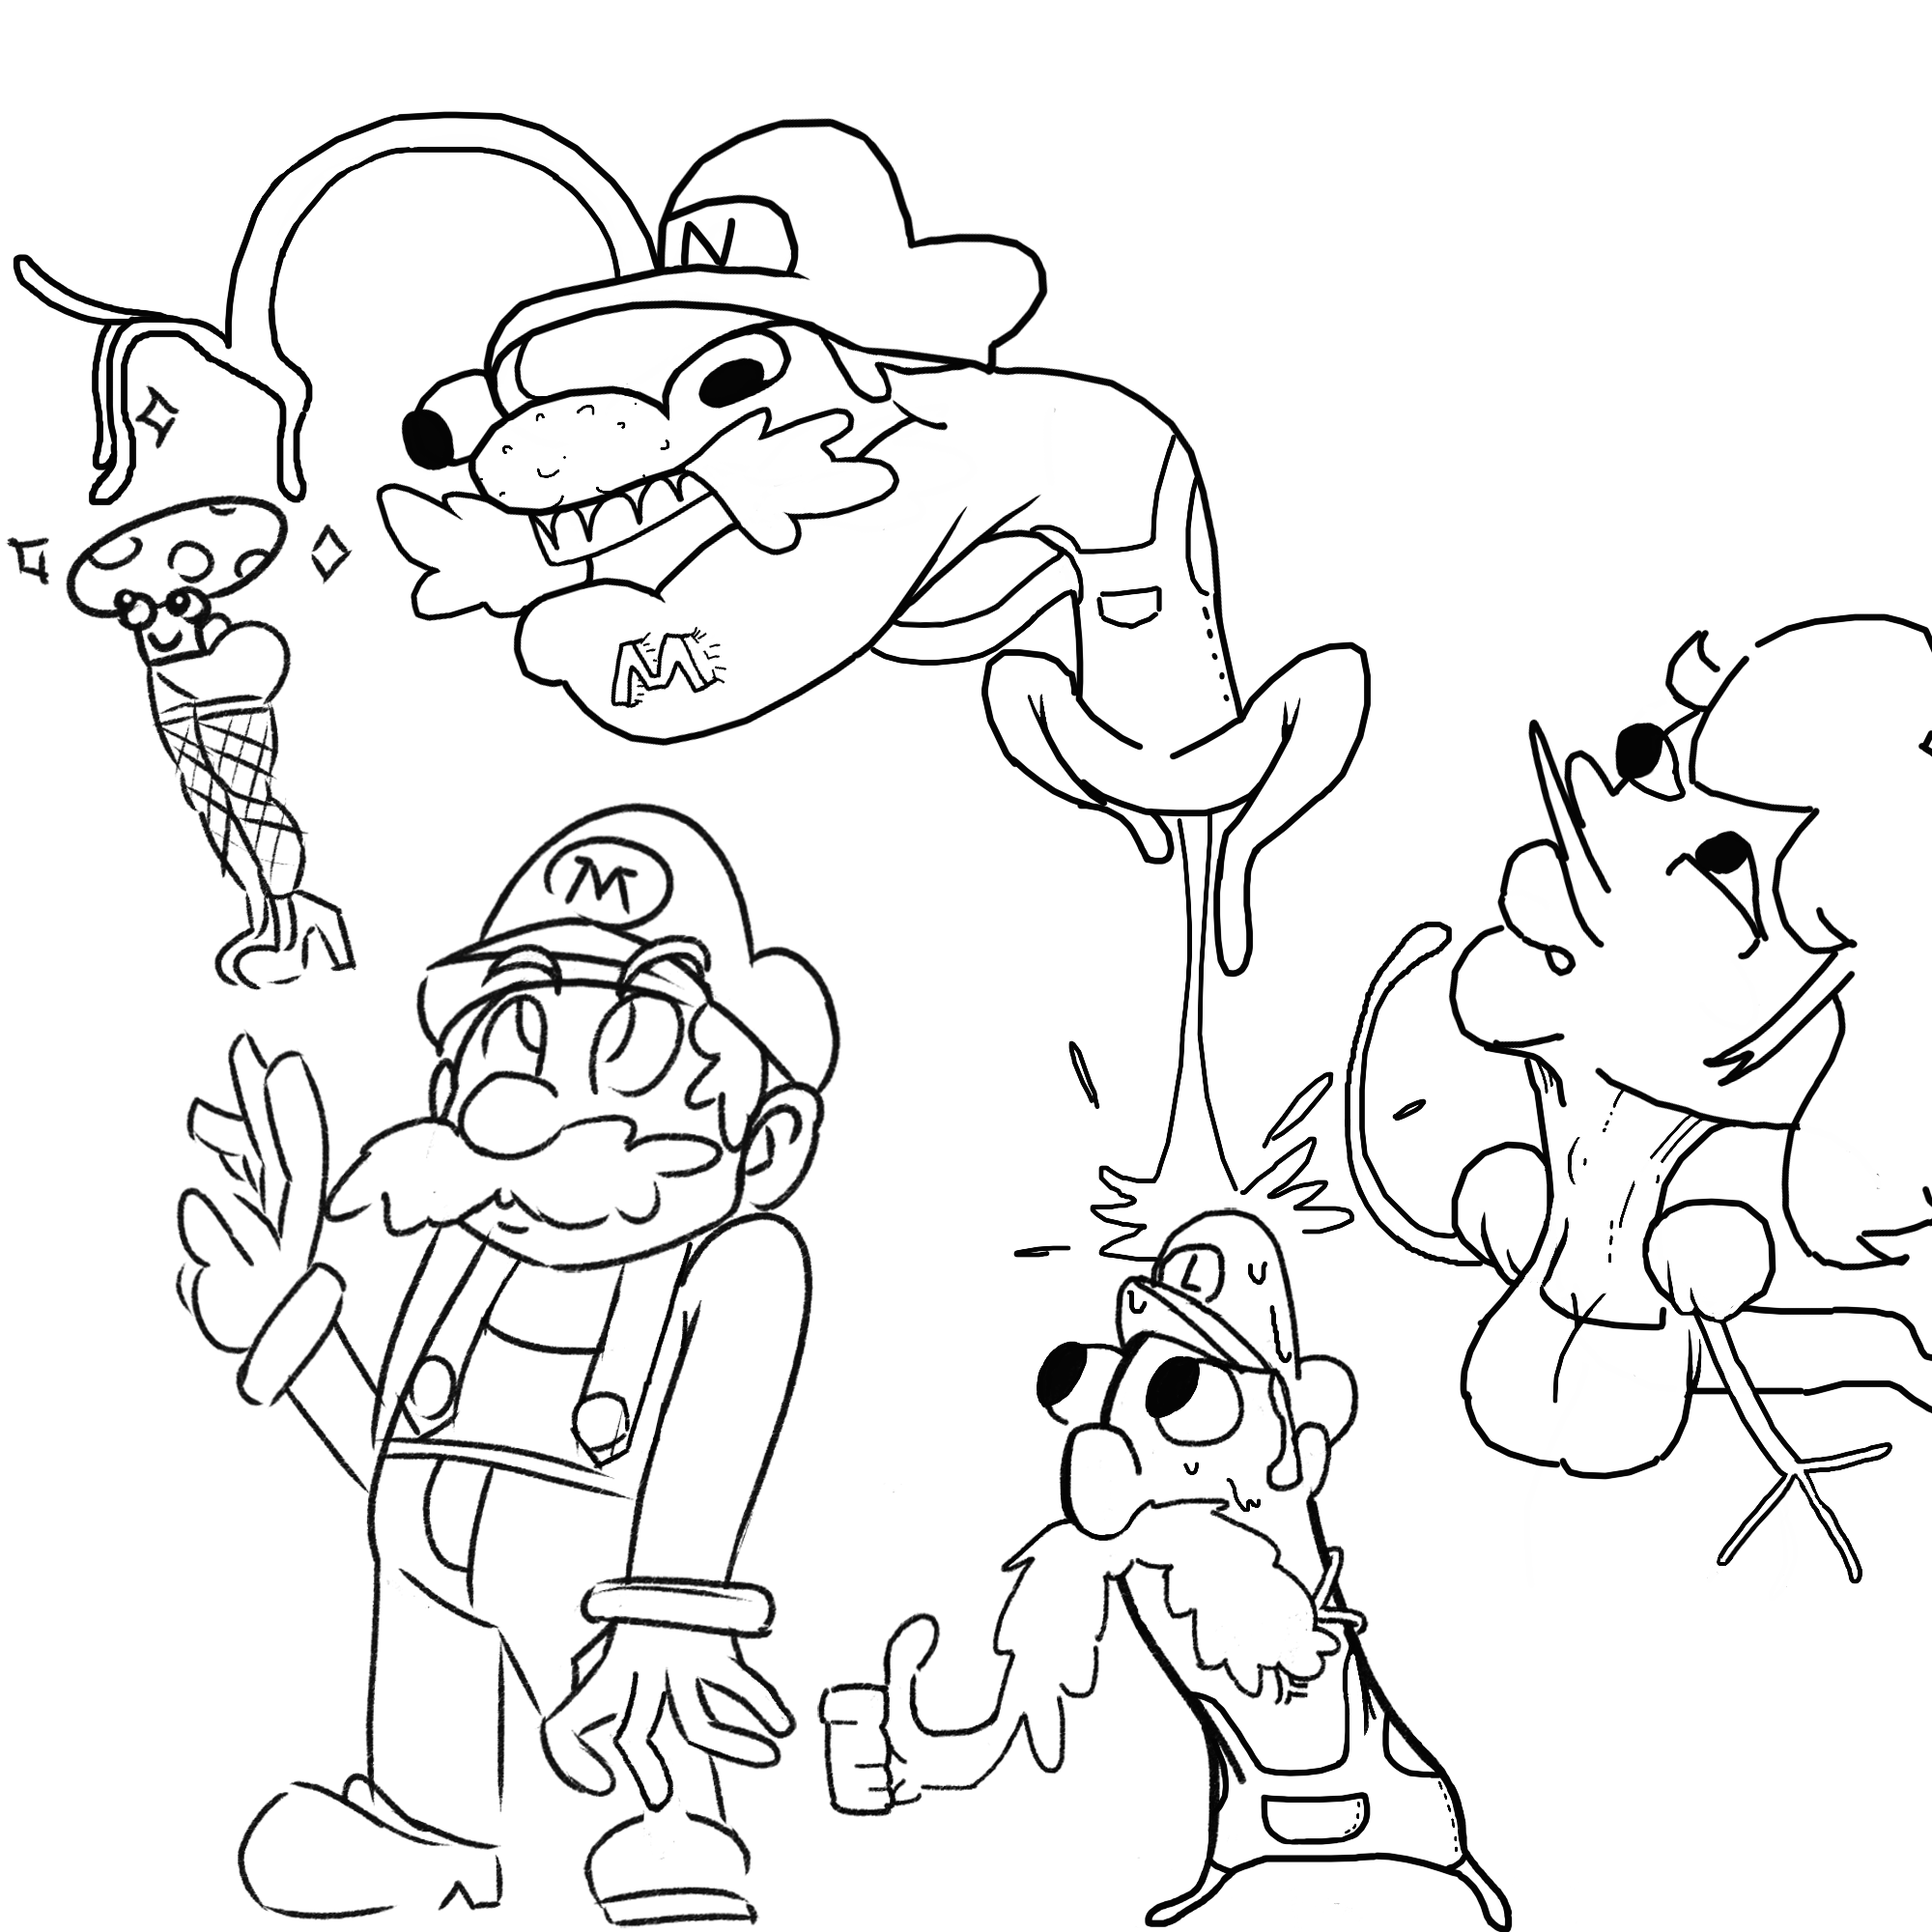 Ew wtf mario the plumber